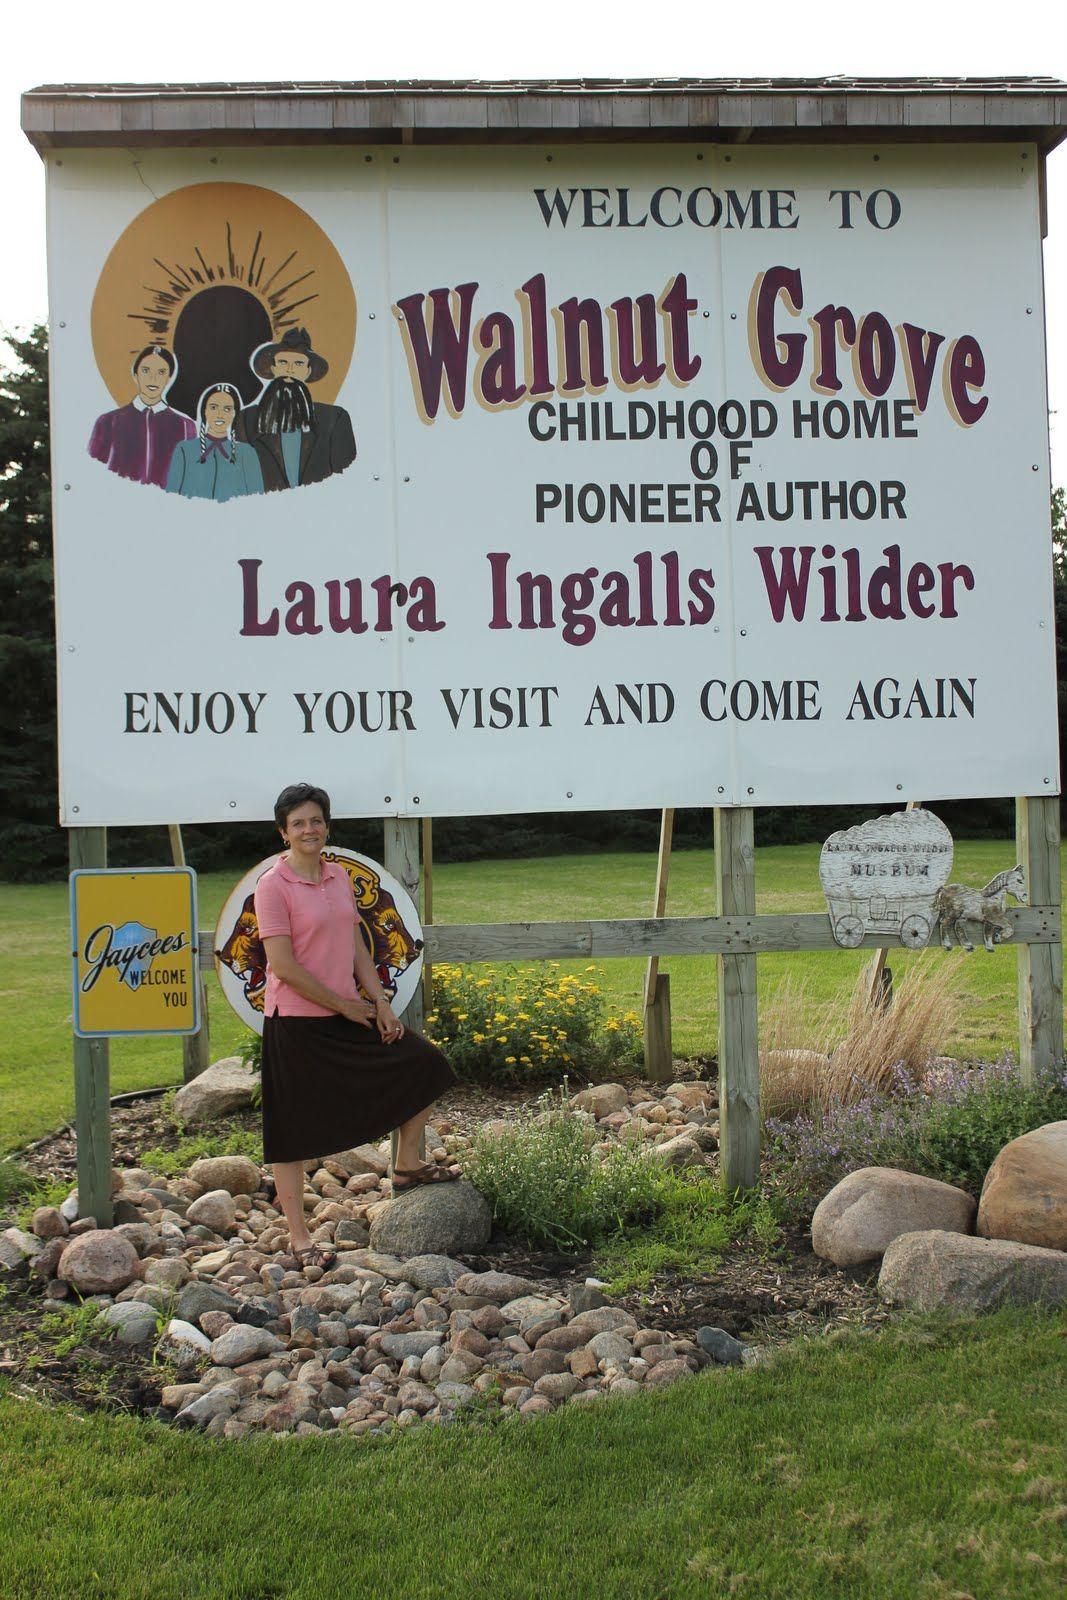 walnut grove, mn laura ingalls wilder costumes will be